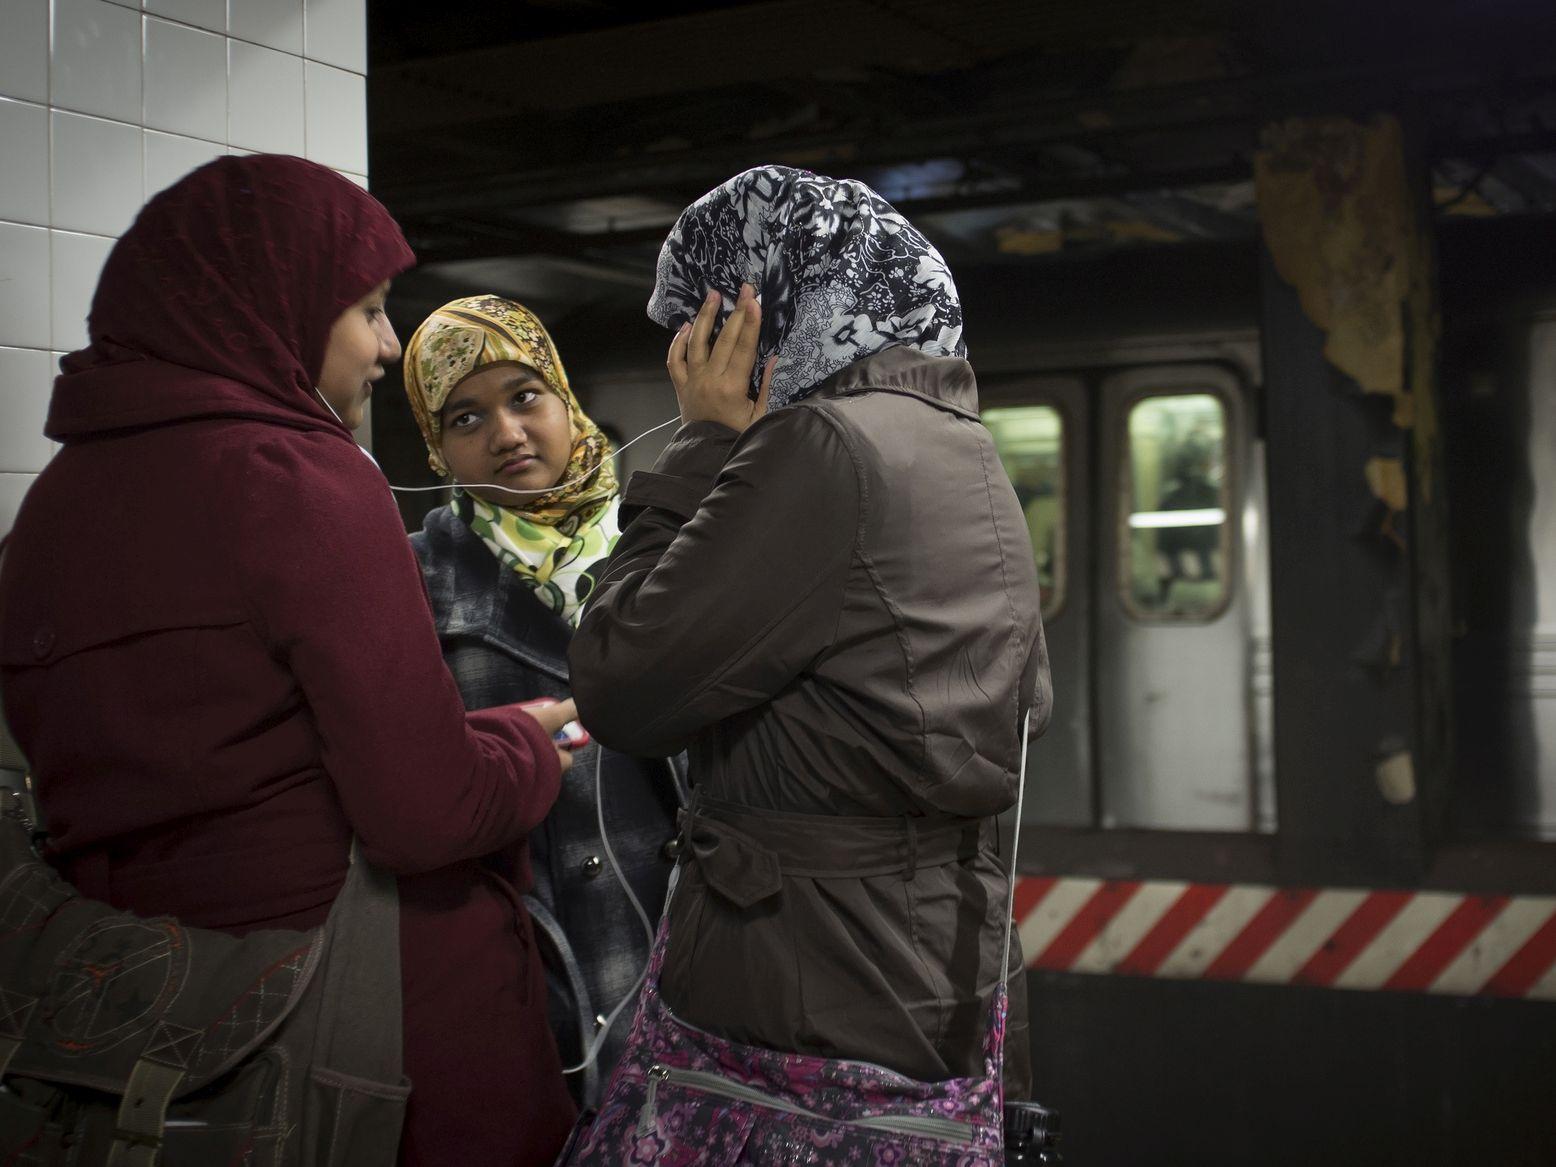 Muzułmanki_metro_Więź